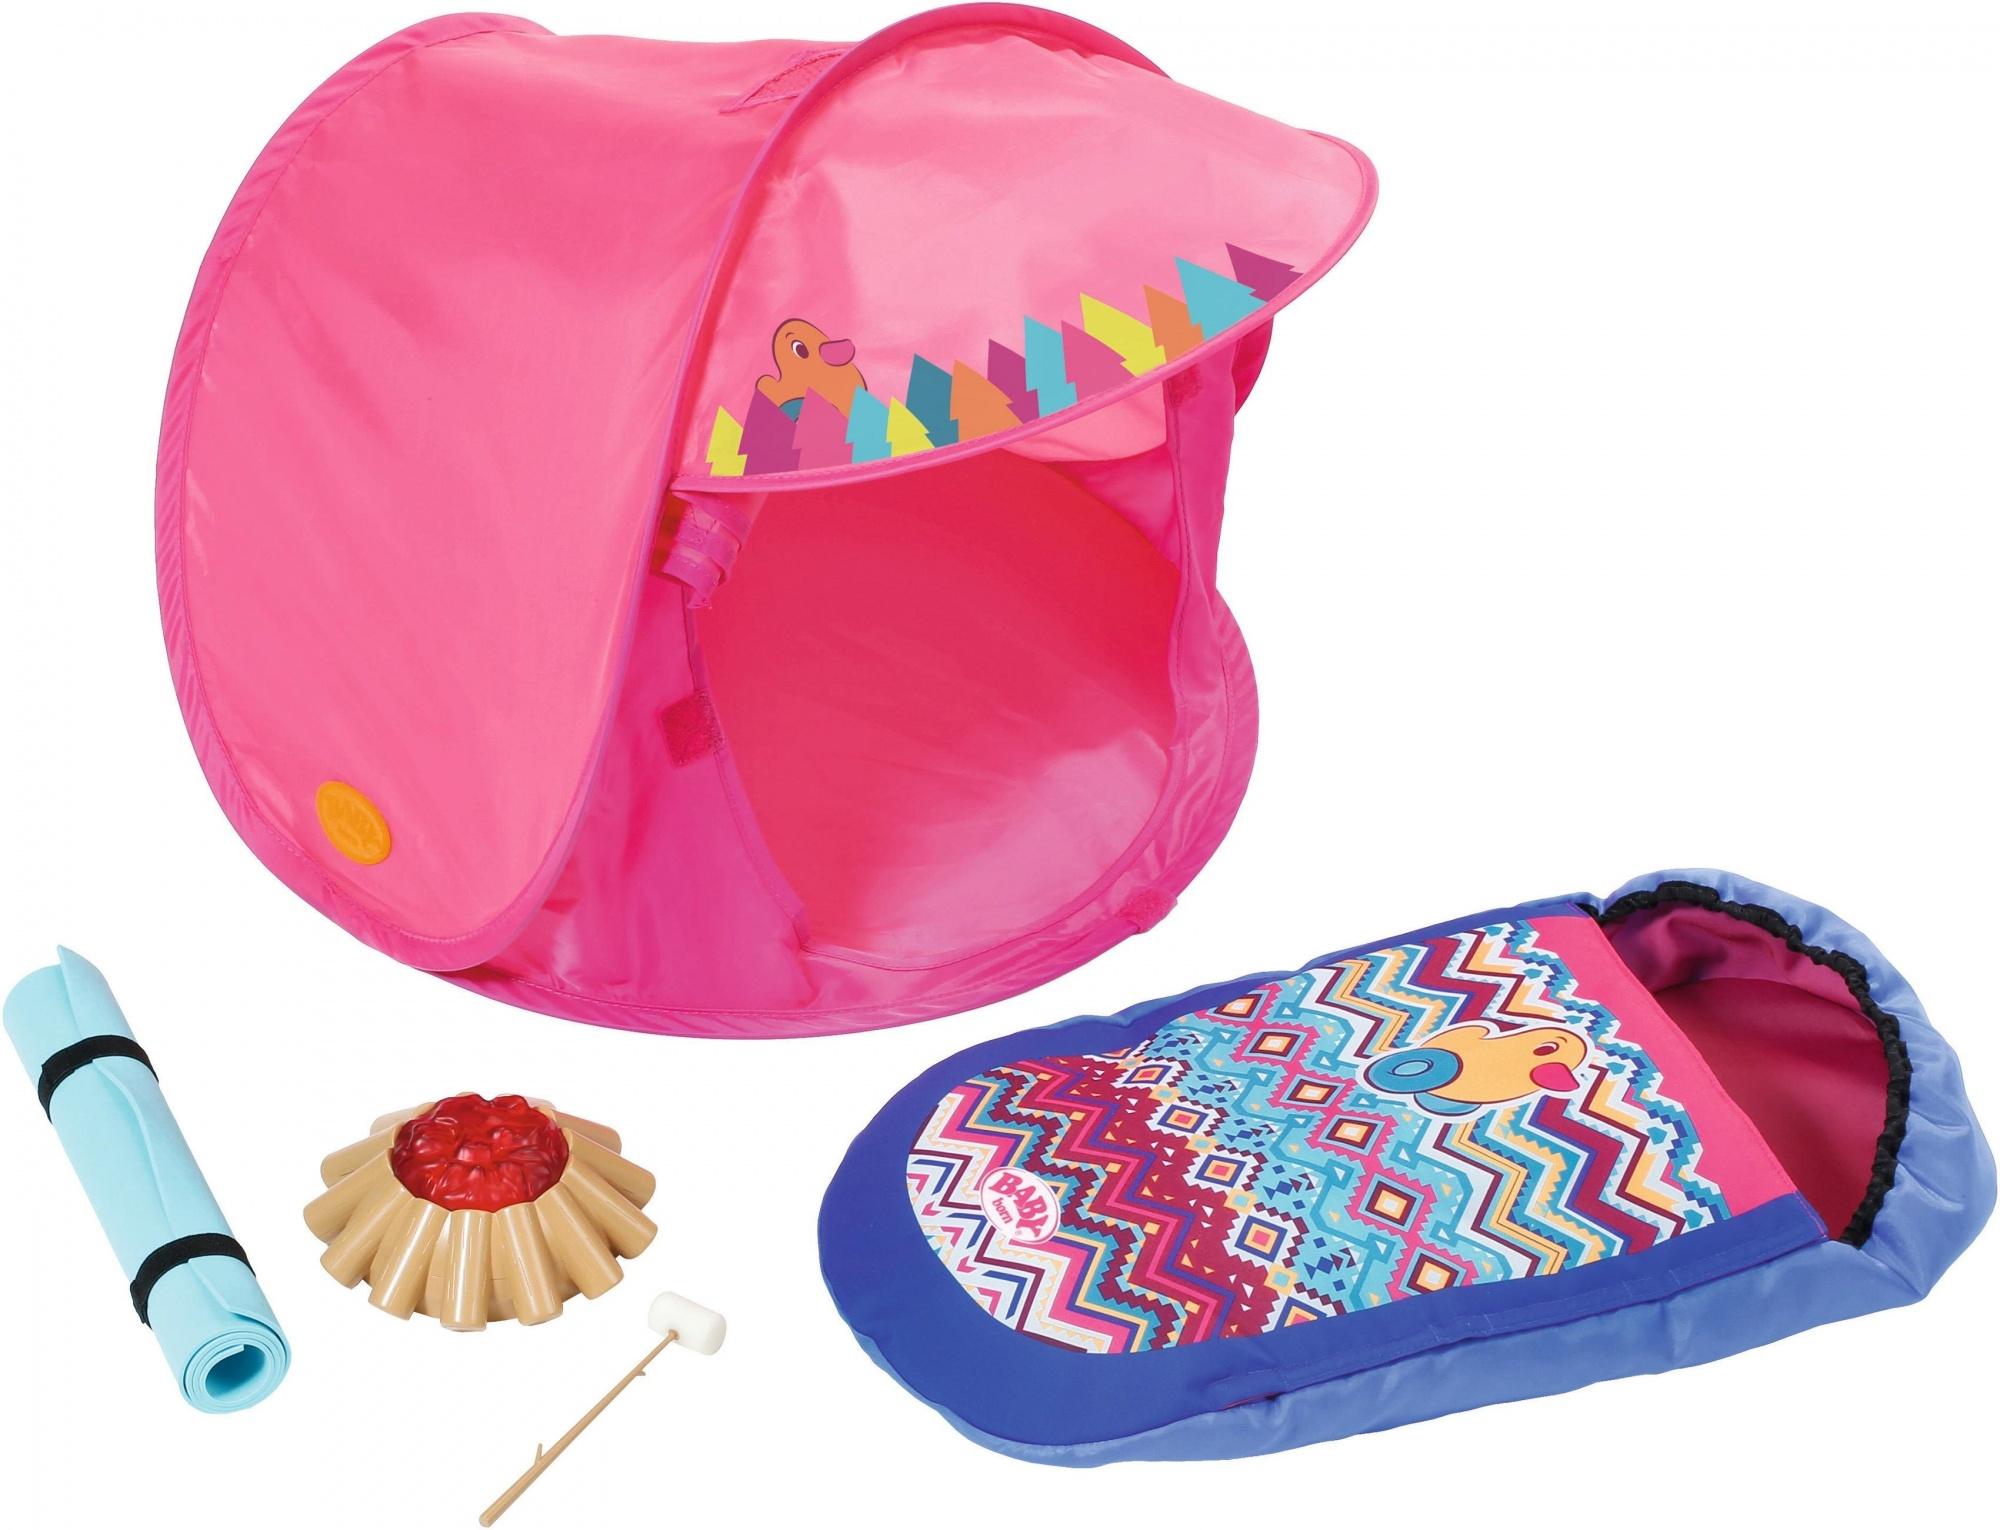 dadf27a474d BABY born Play & Fun Campsite set pink 5-piece - Internet-Toys